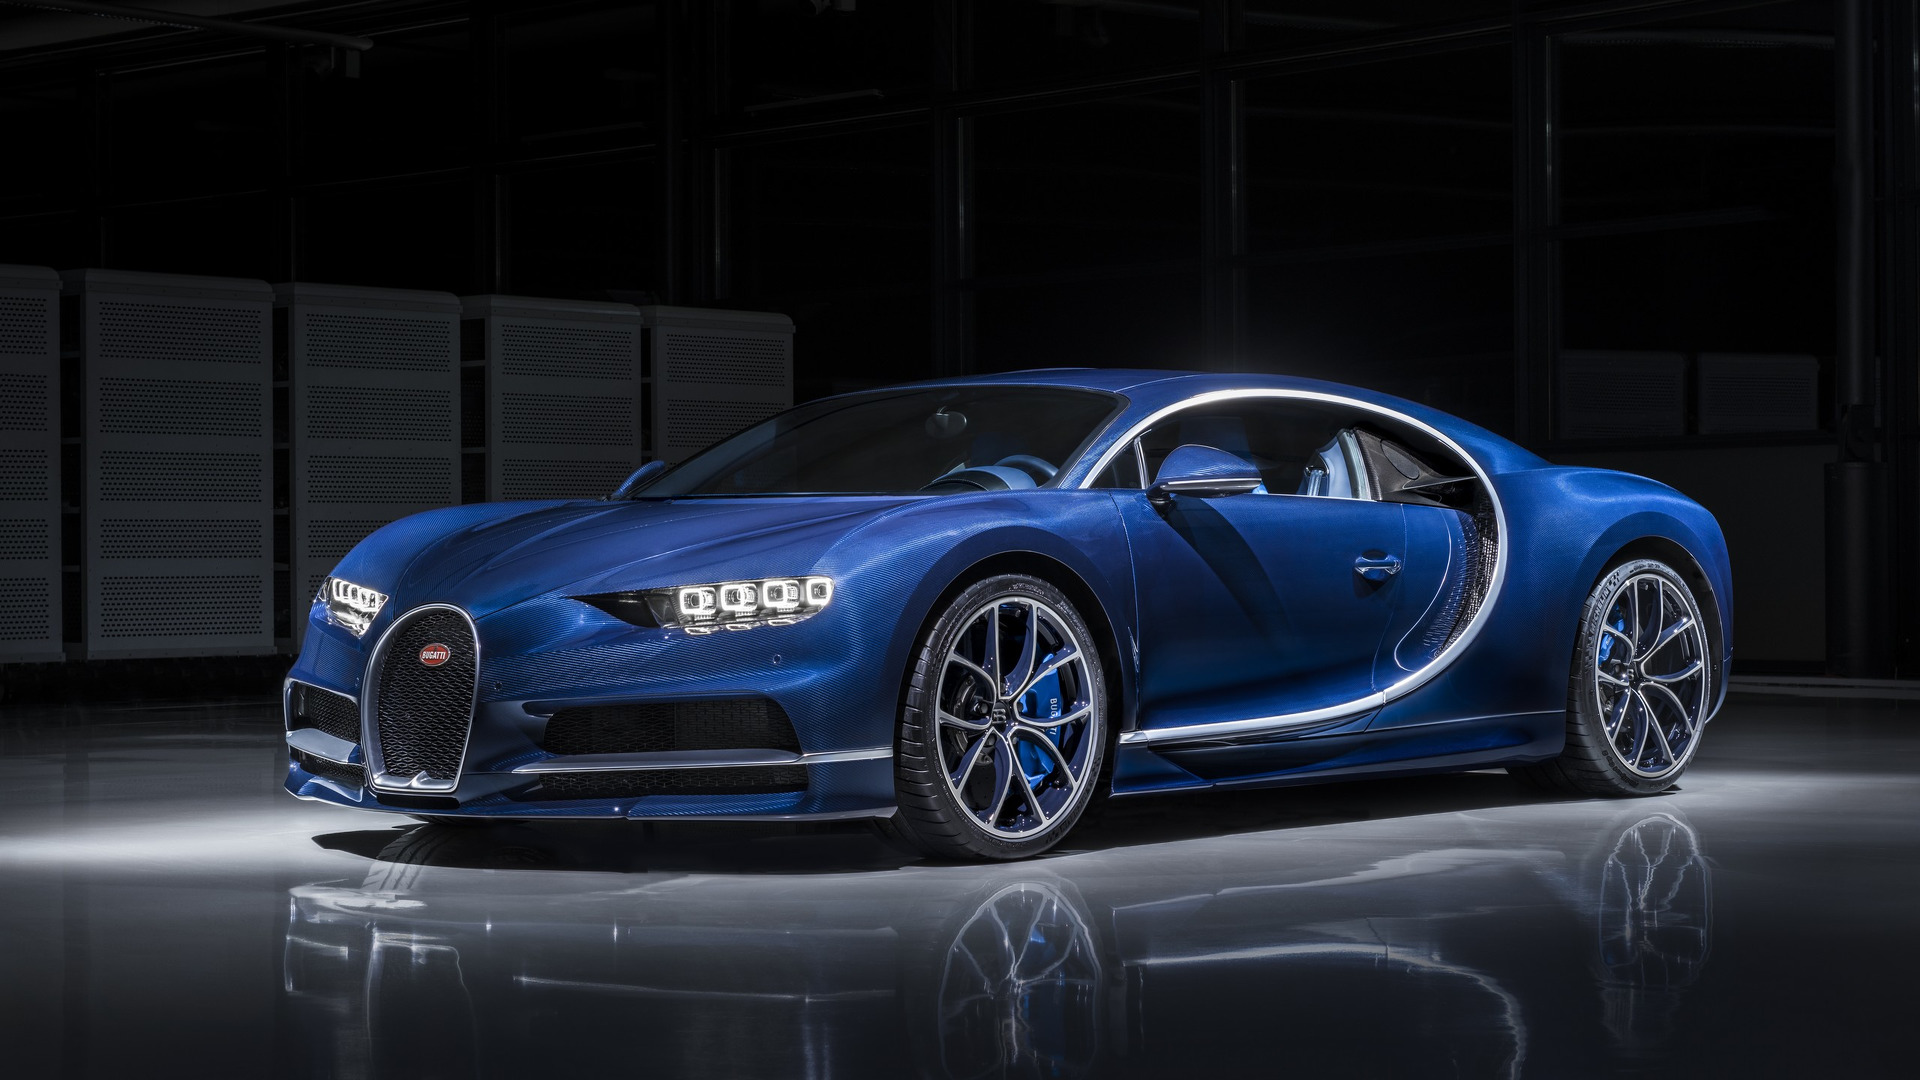 bugatti chiron in 39 bleu royal 39 exposed carbon fibre will. Black Bedroom Furniture Sets. Home Design Ideas